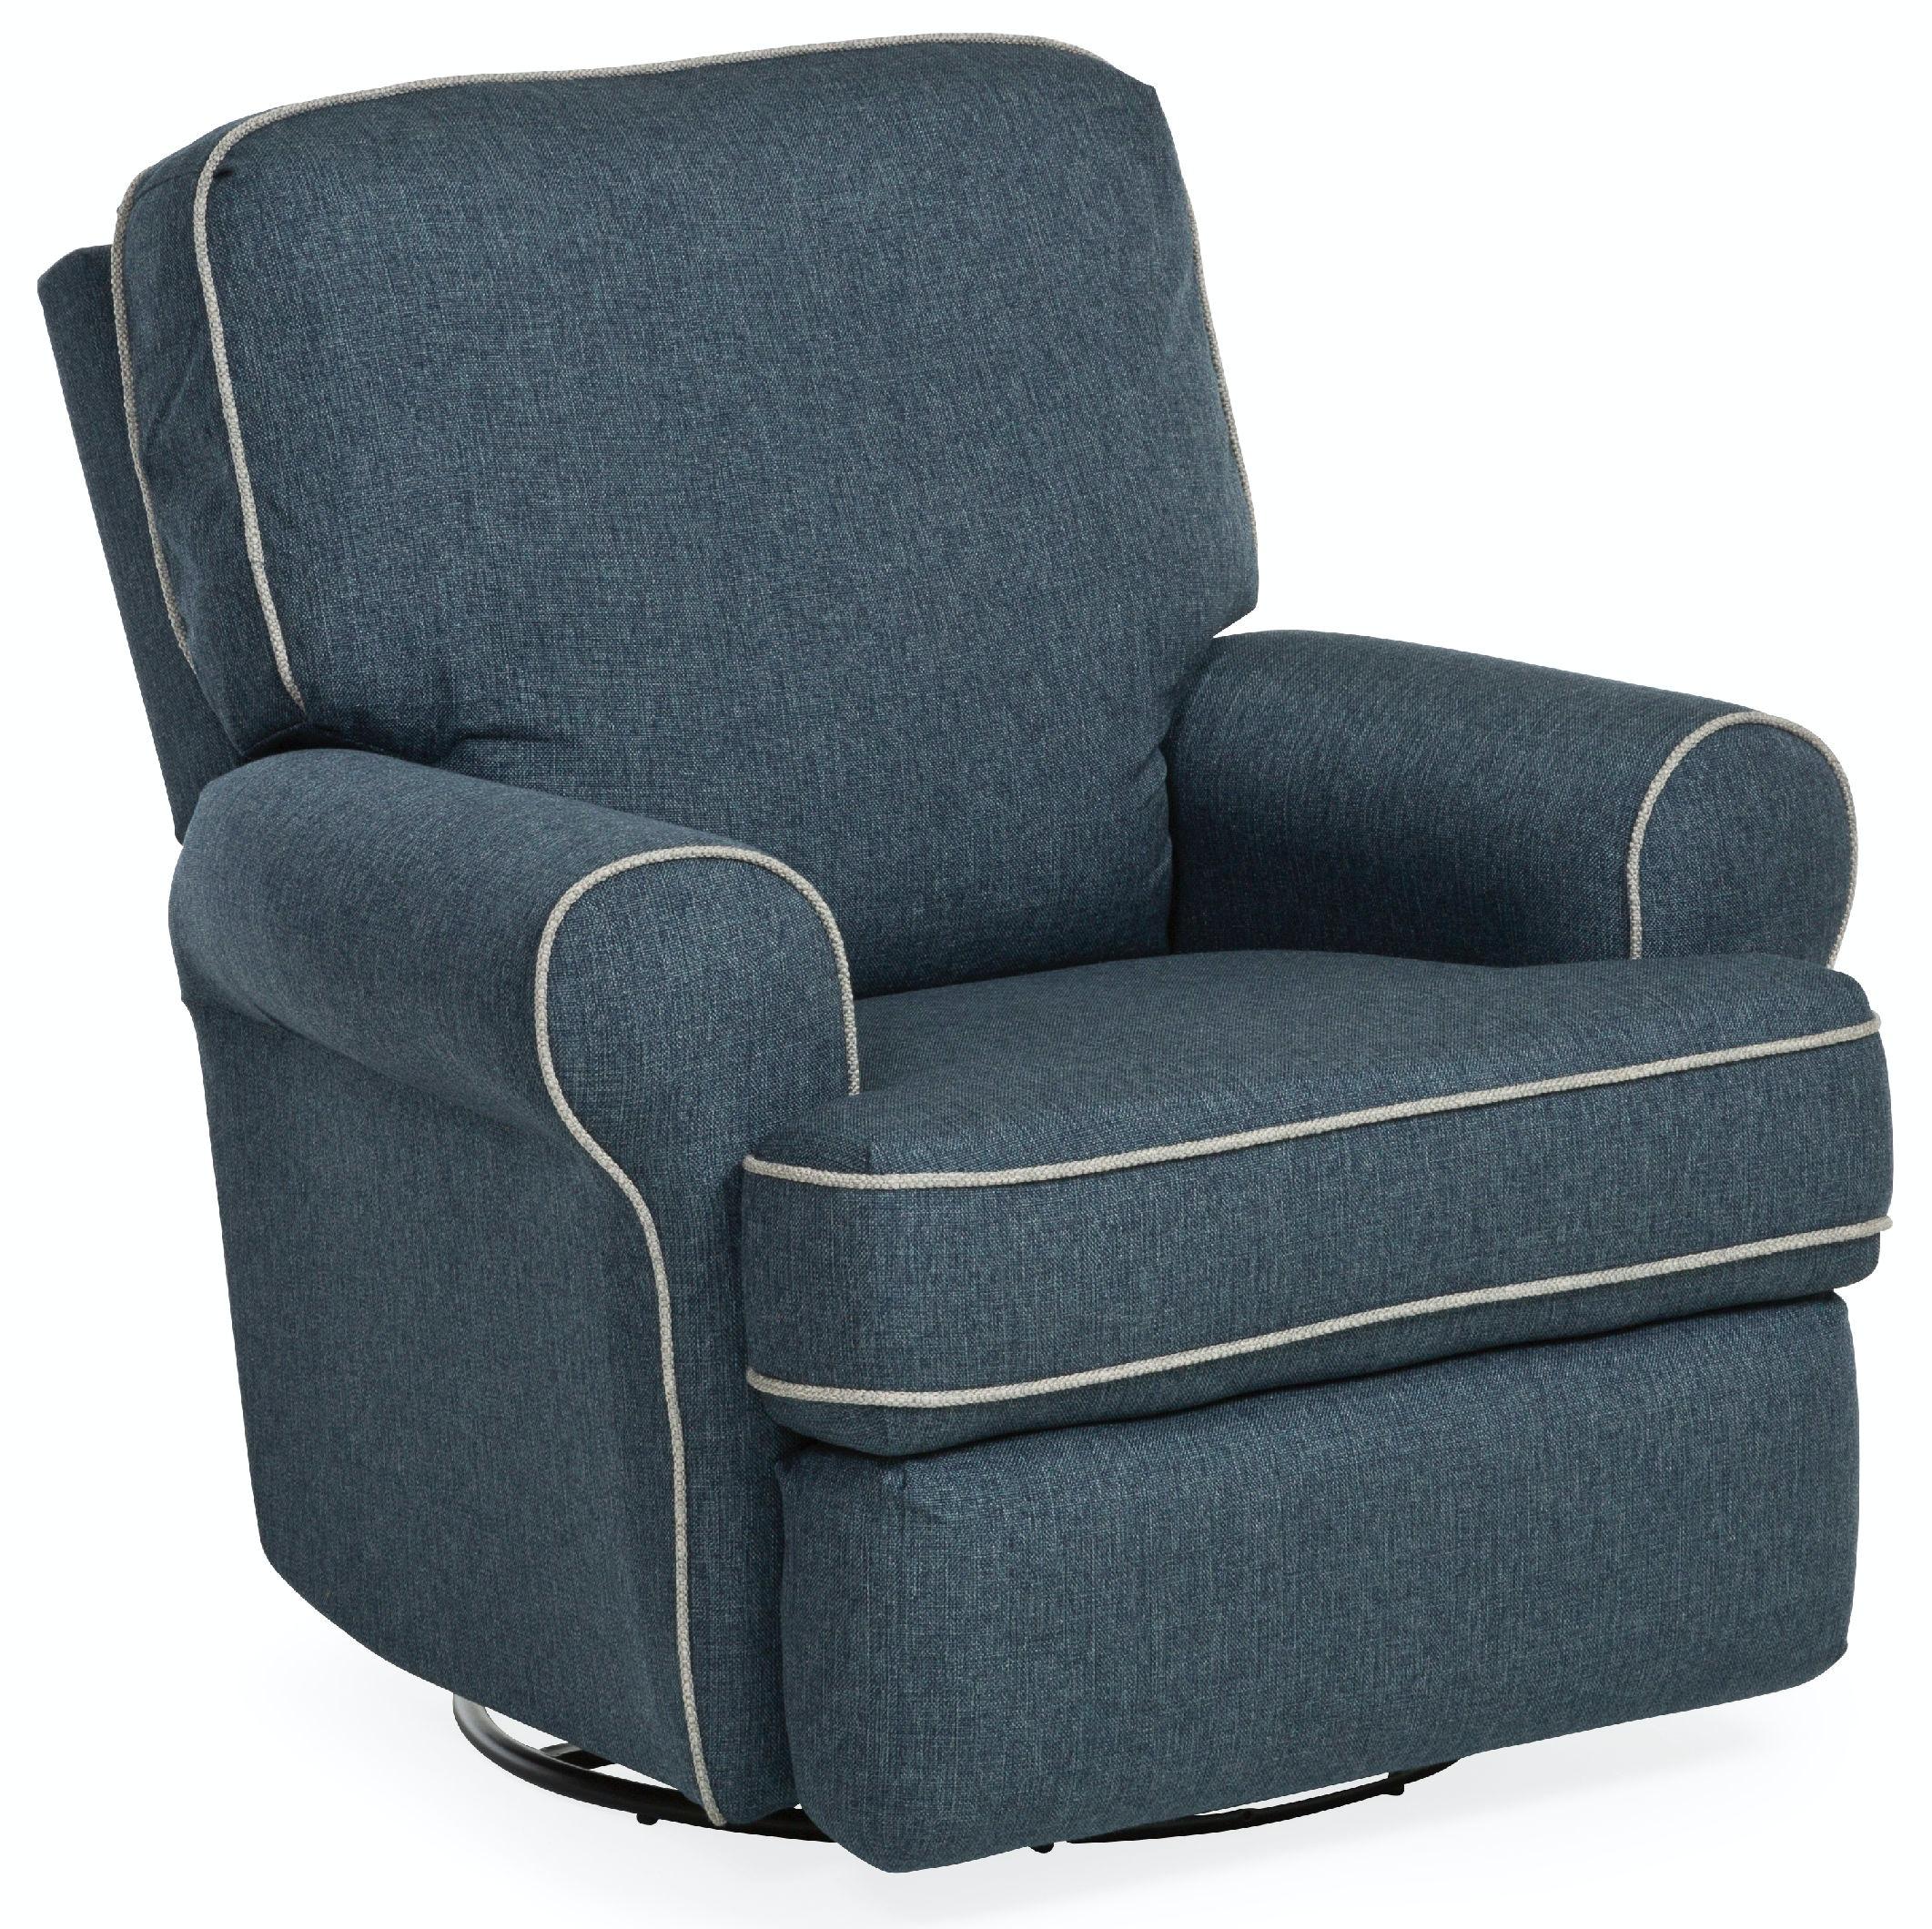 Superbe Tryp Swivel/Glider Recliner Chair ST:471298